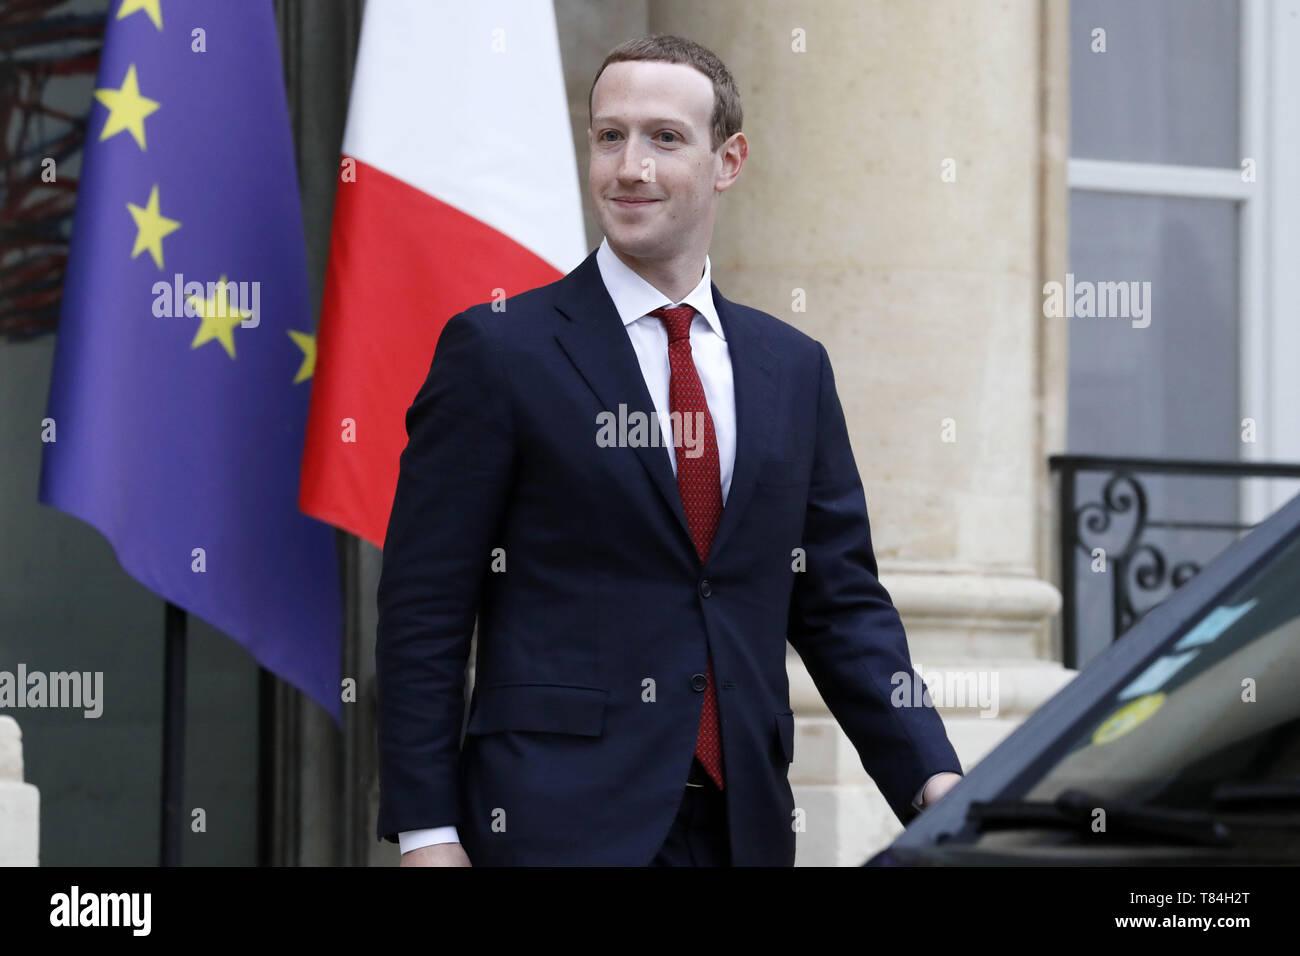 Calendrier Meeting Macron 2019.Ceo Mark Zuckerberg Stock Photos Ceo Mark Zuckerberg Stock